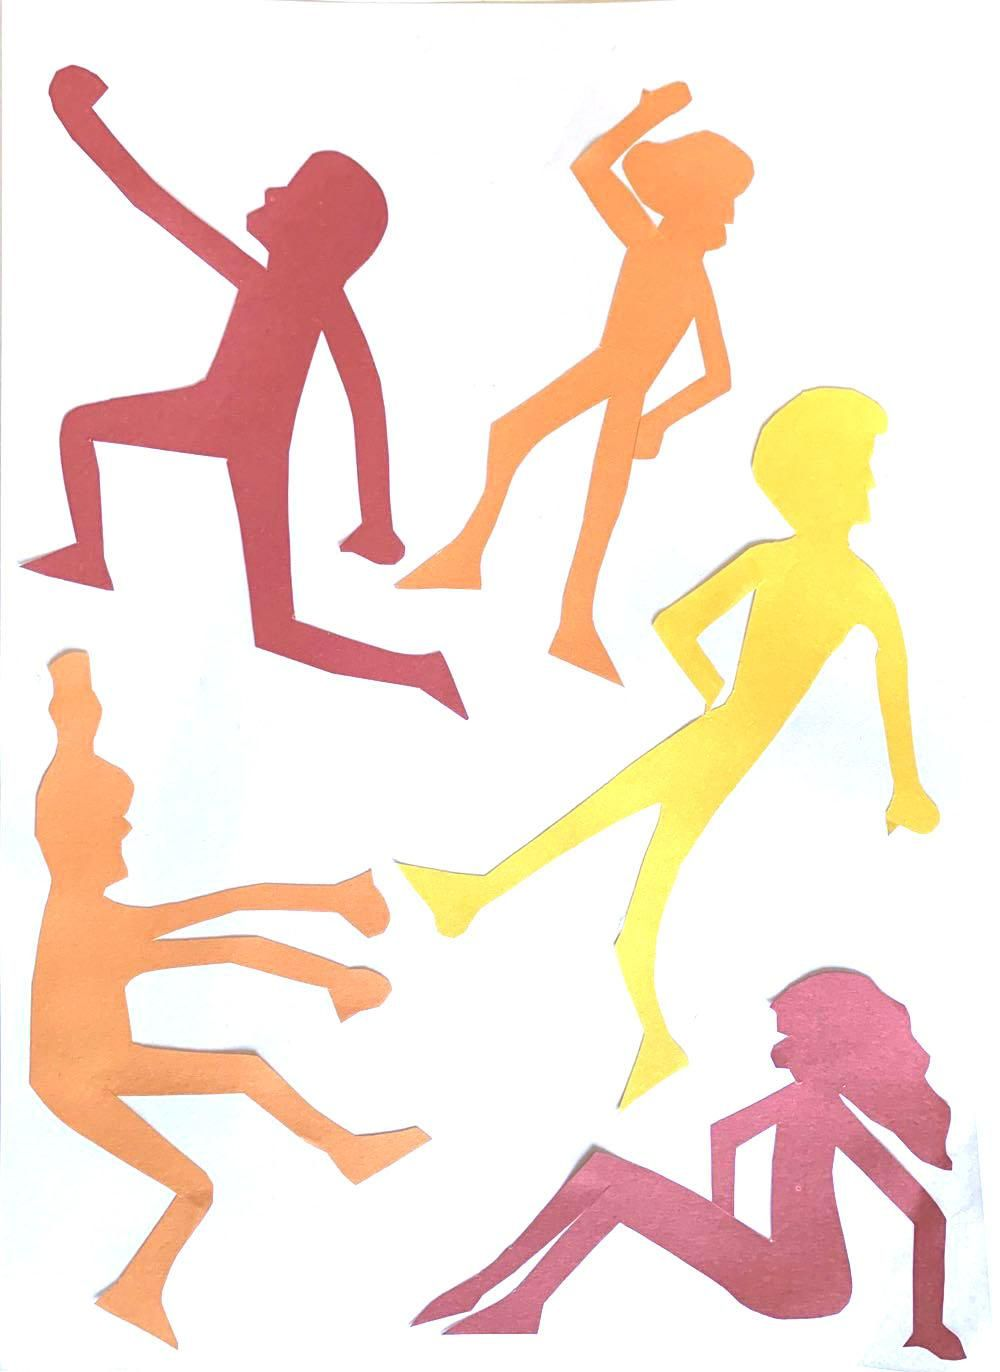 Valentina's Odd Bodies - image 4 - student project